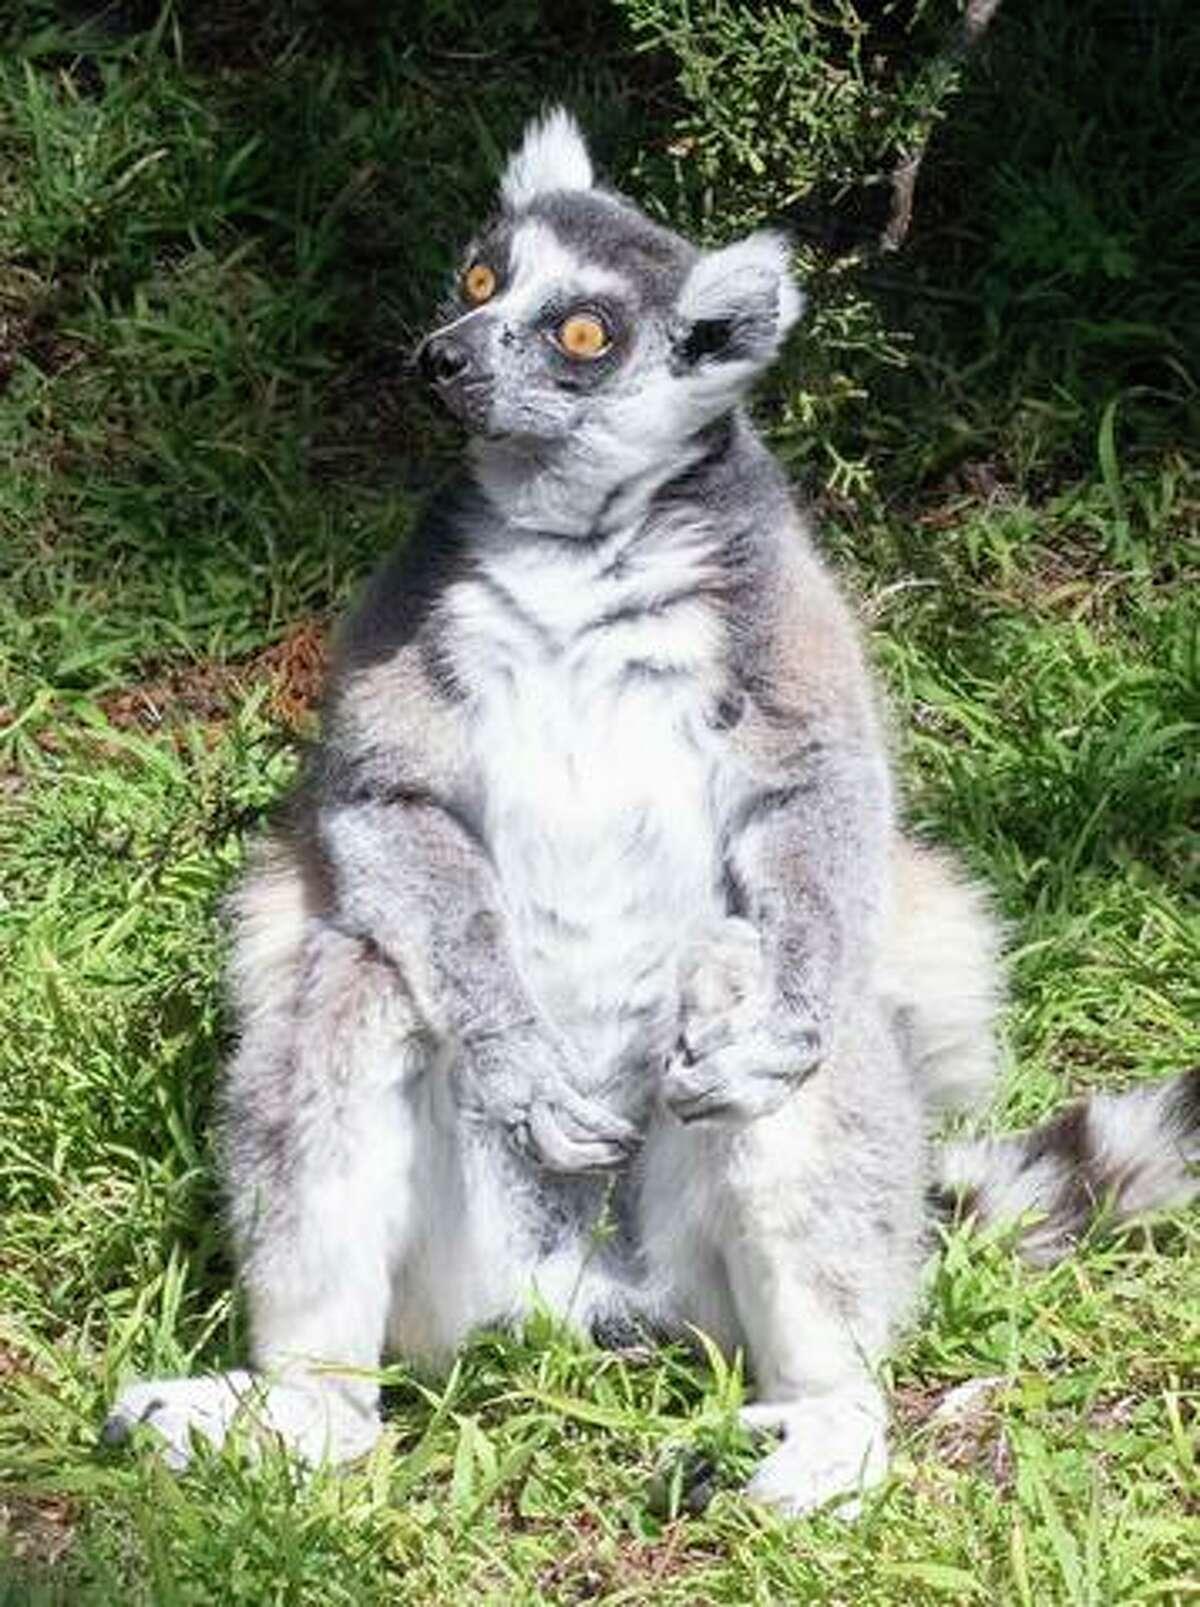 Maki, the lemur stolen last year from S.F. Zoo.